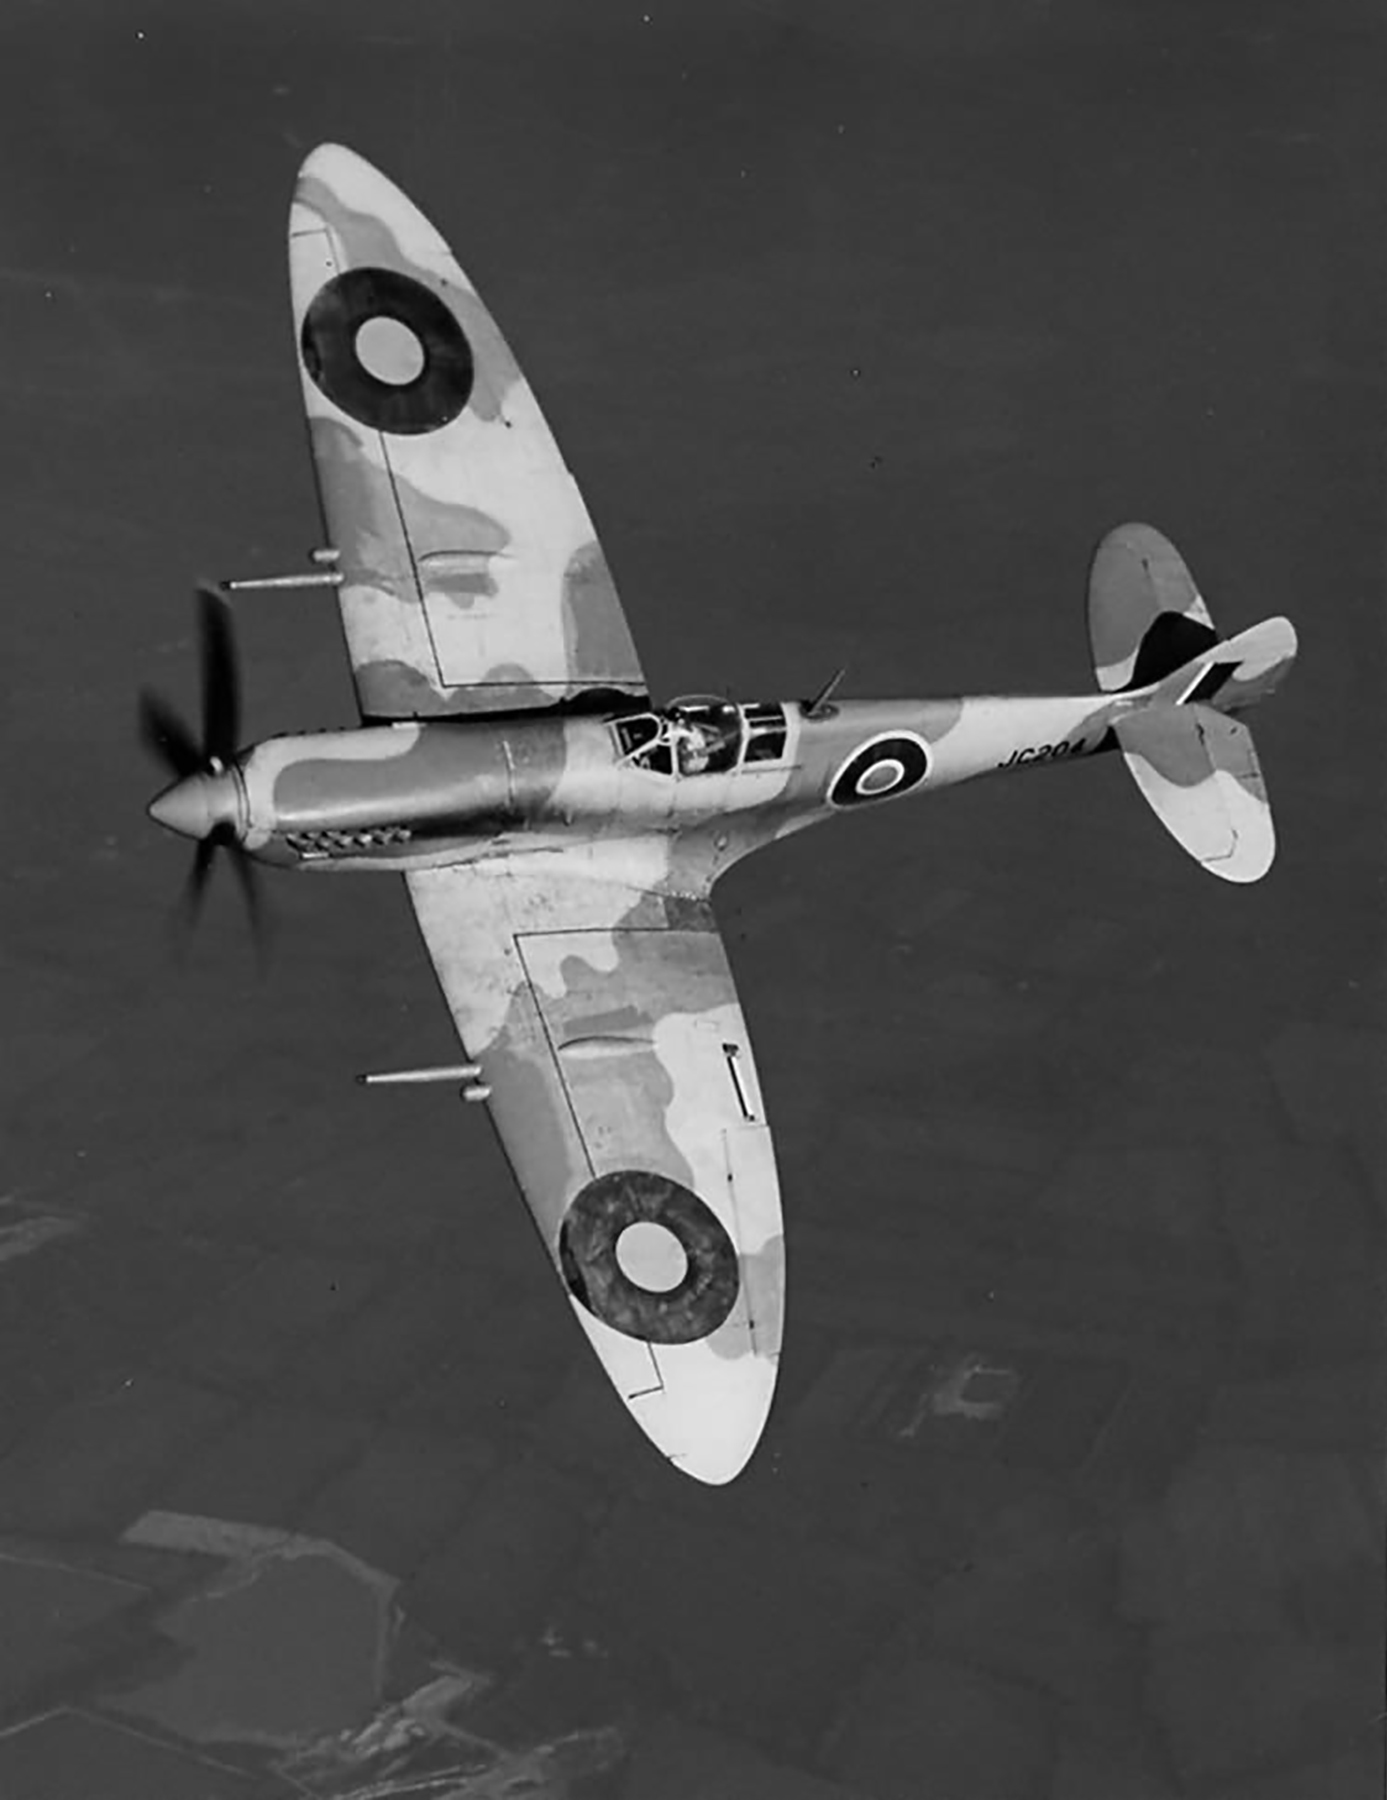 Factory fresh Spitfire MkVIII RAF JC204 in Flight web 01